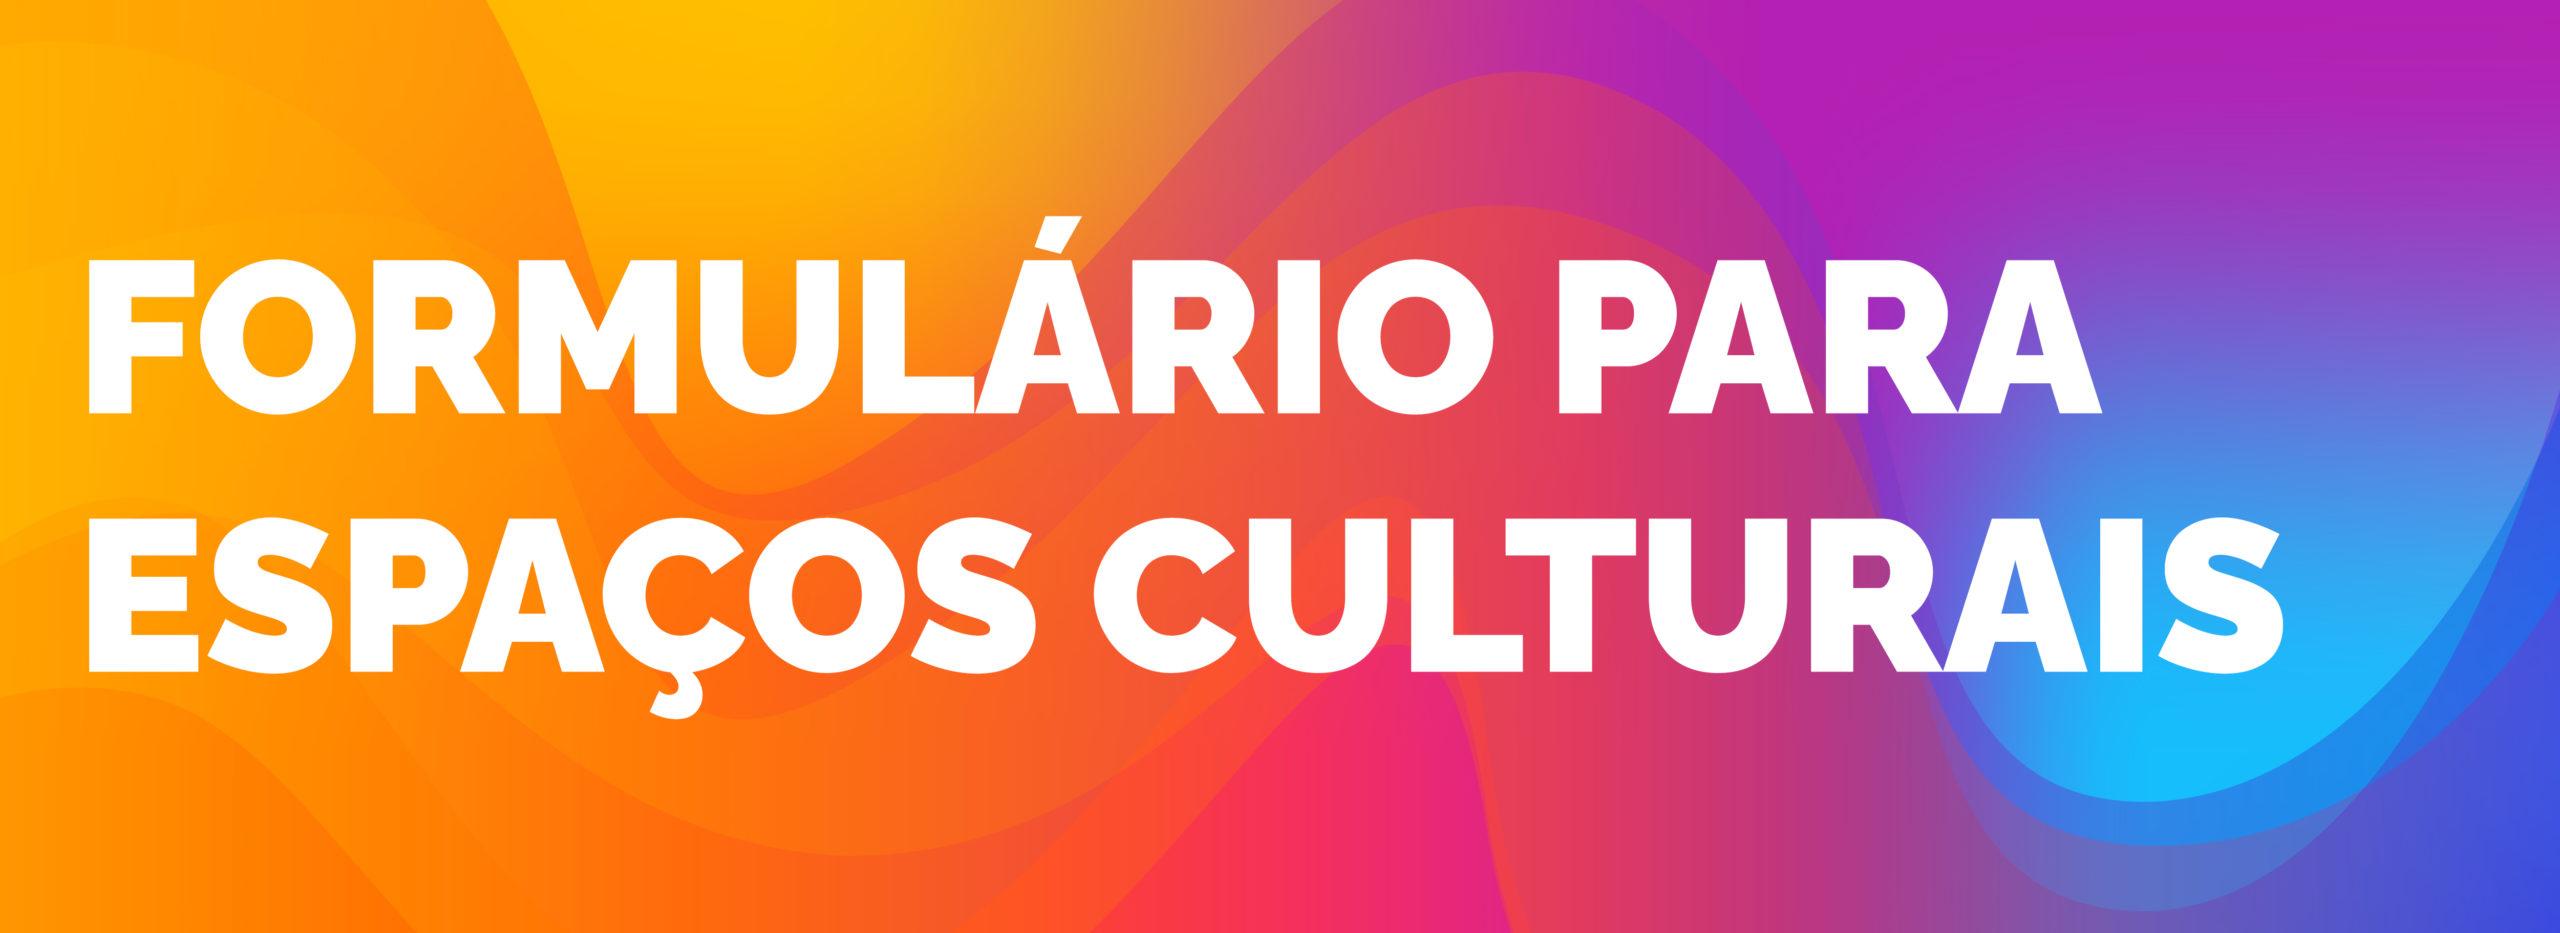 formulario-espaco-culturais